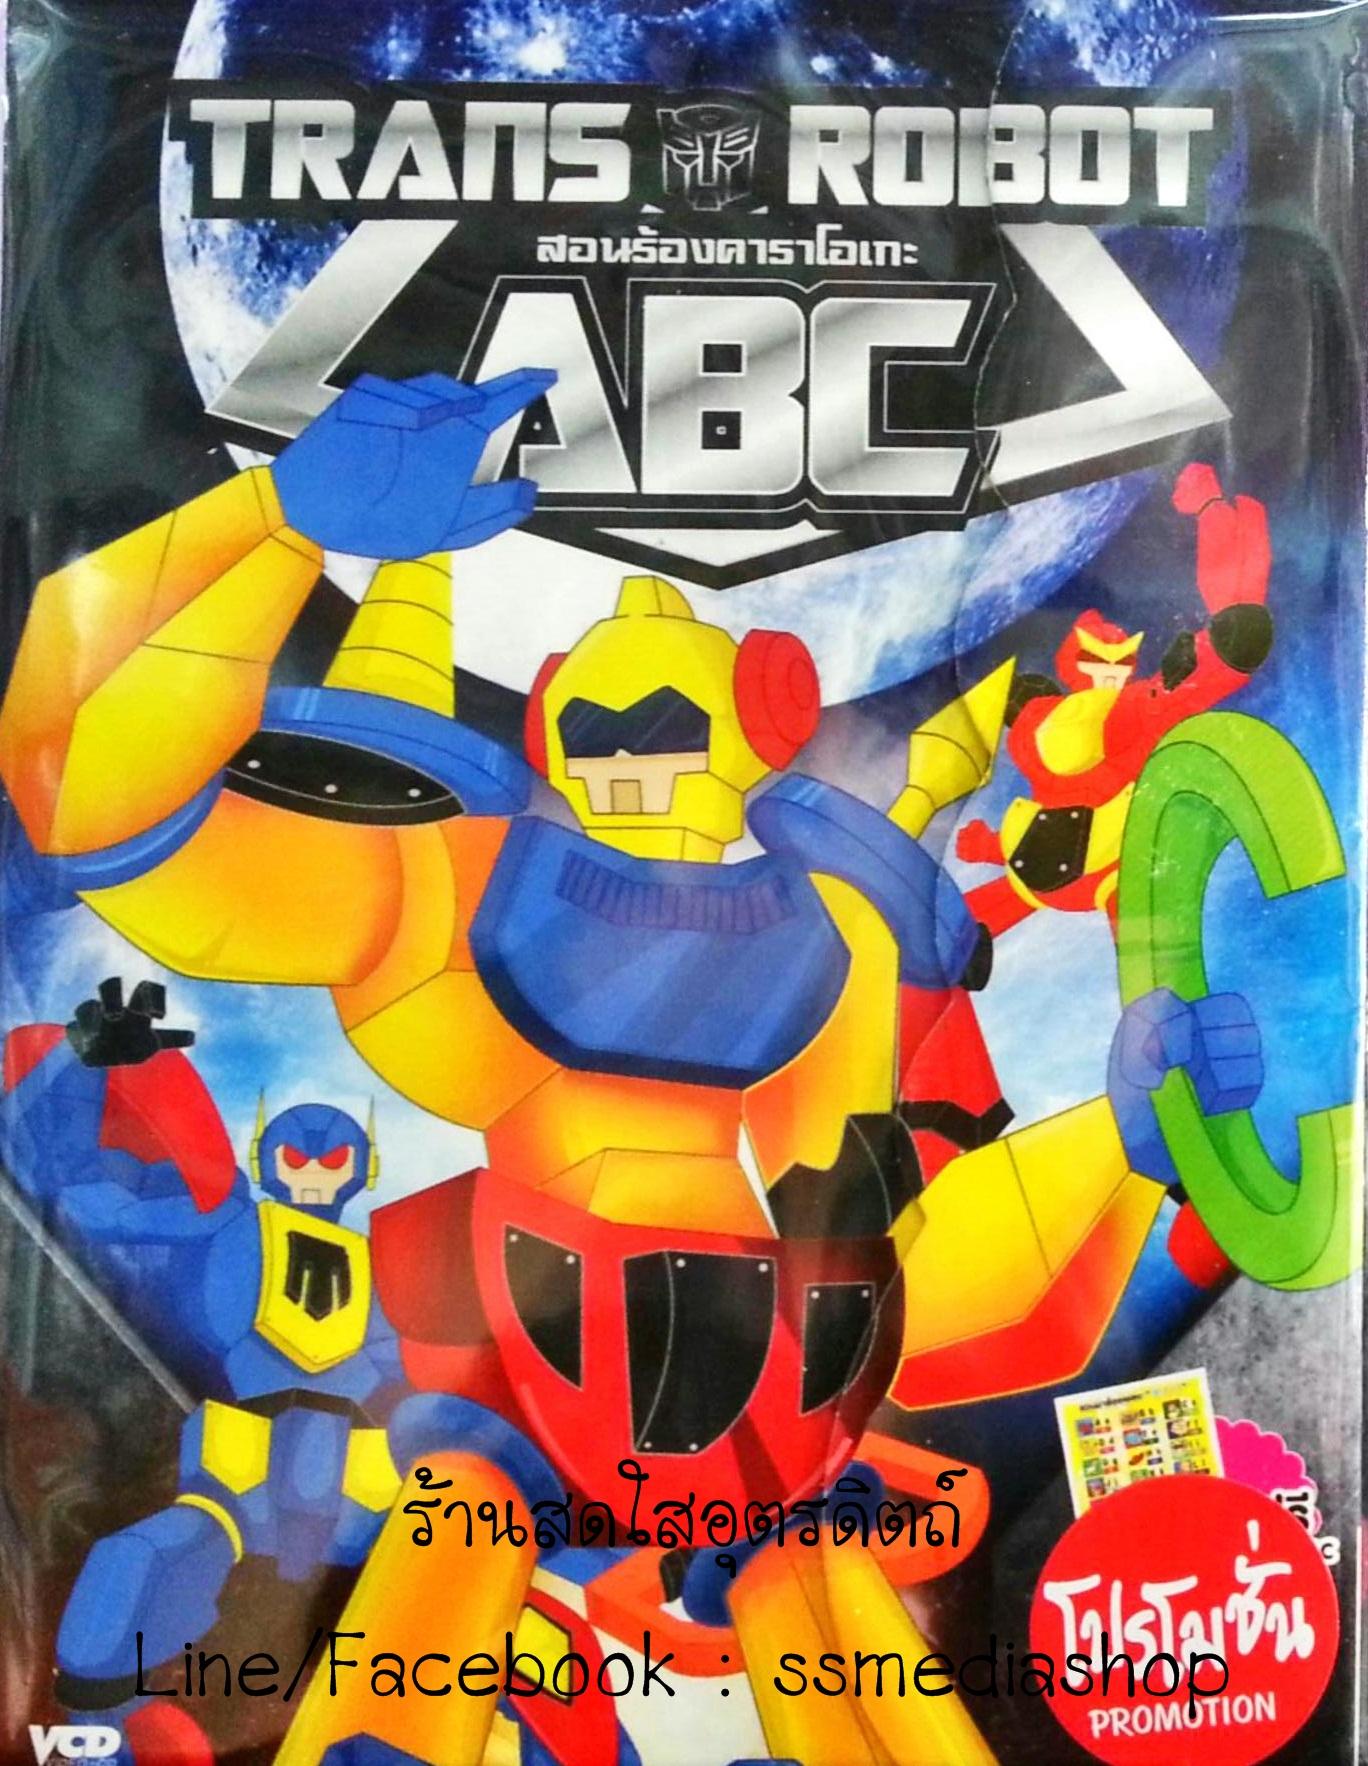 VCD Trans robod สอนร้องคาราโอเกะ ABC